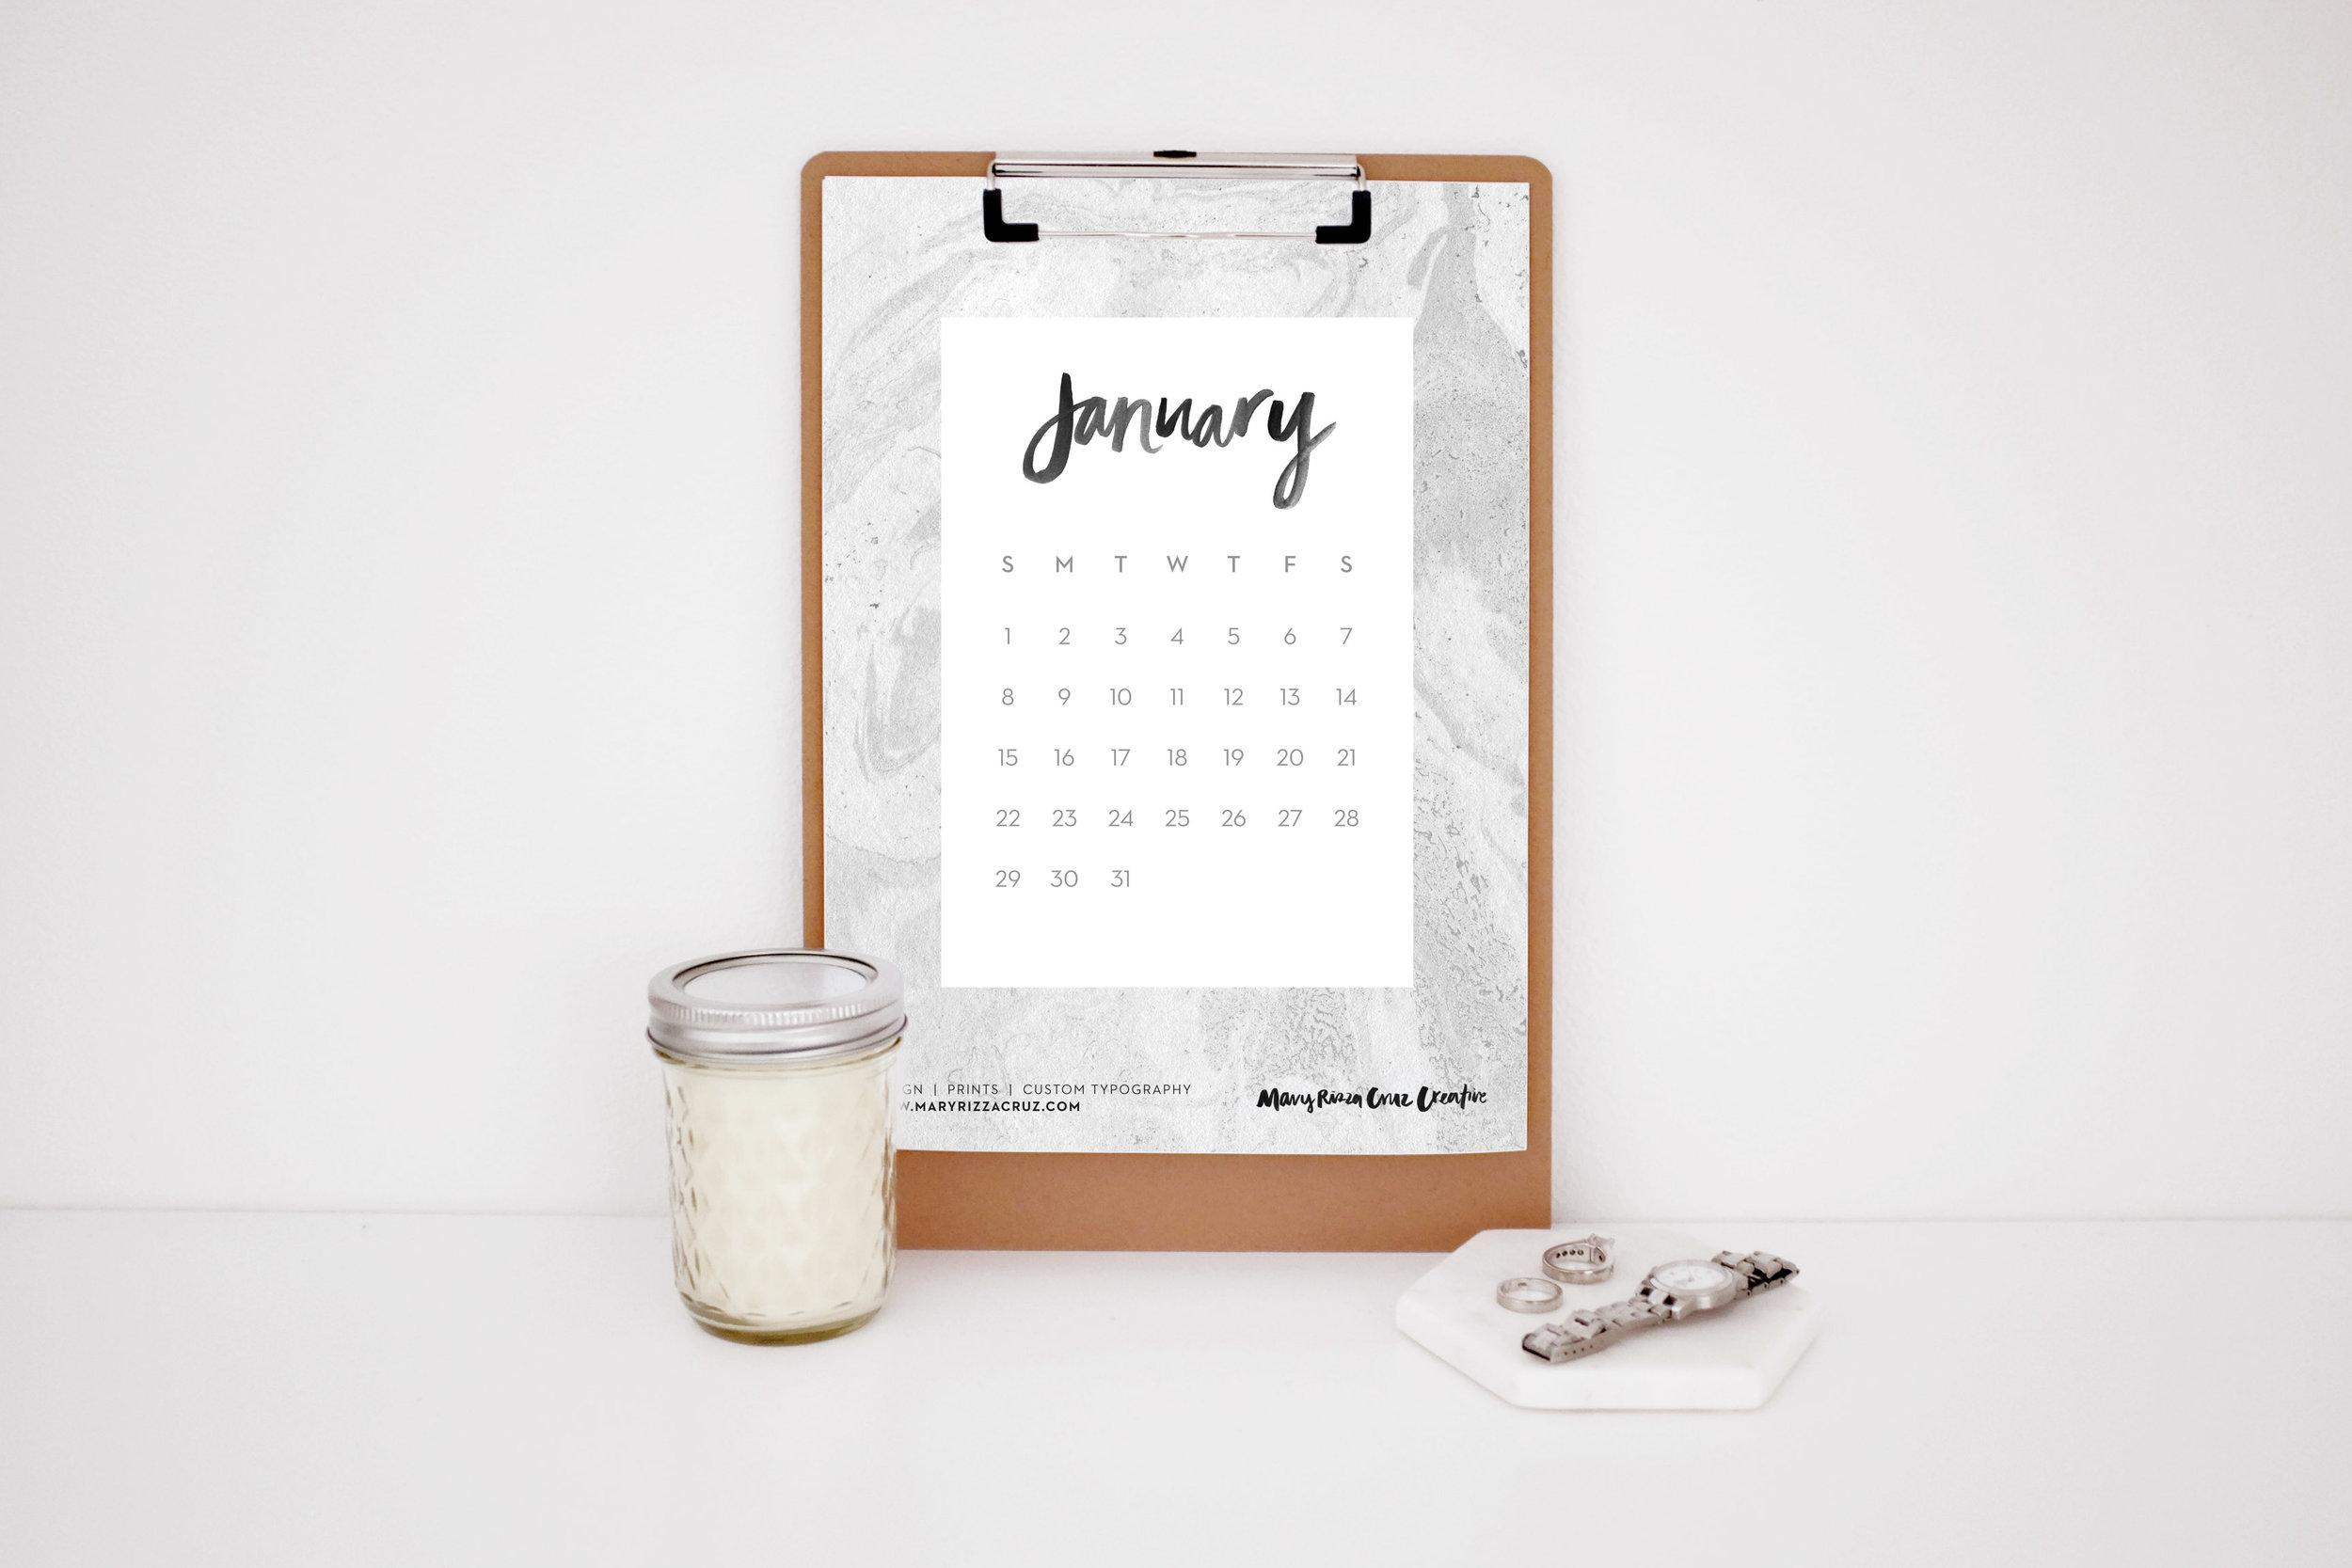 MaryRizzaCruzCreative_2017Calendar-JanInk_Clipboard_StyledWatchRingsCandle_2016.jpg